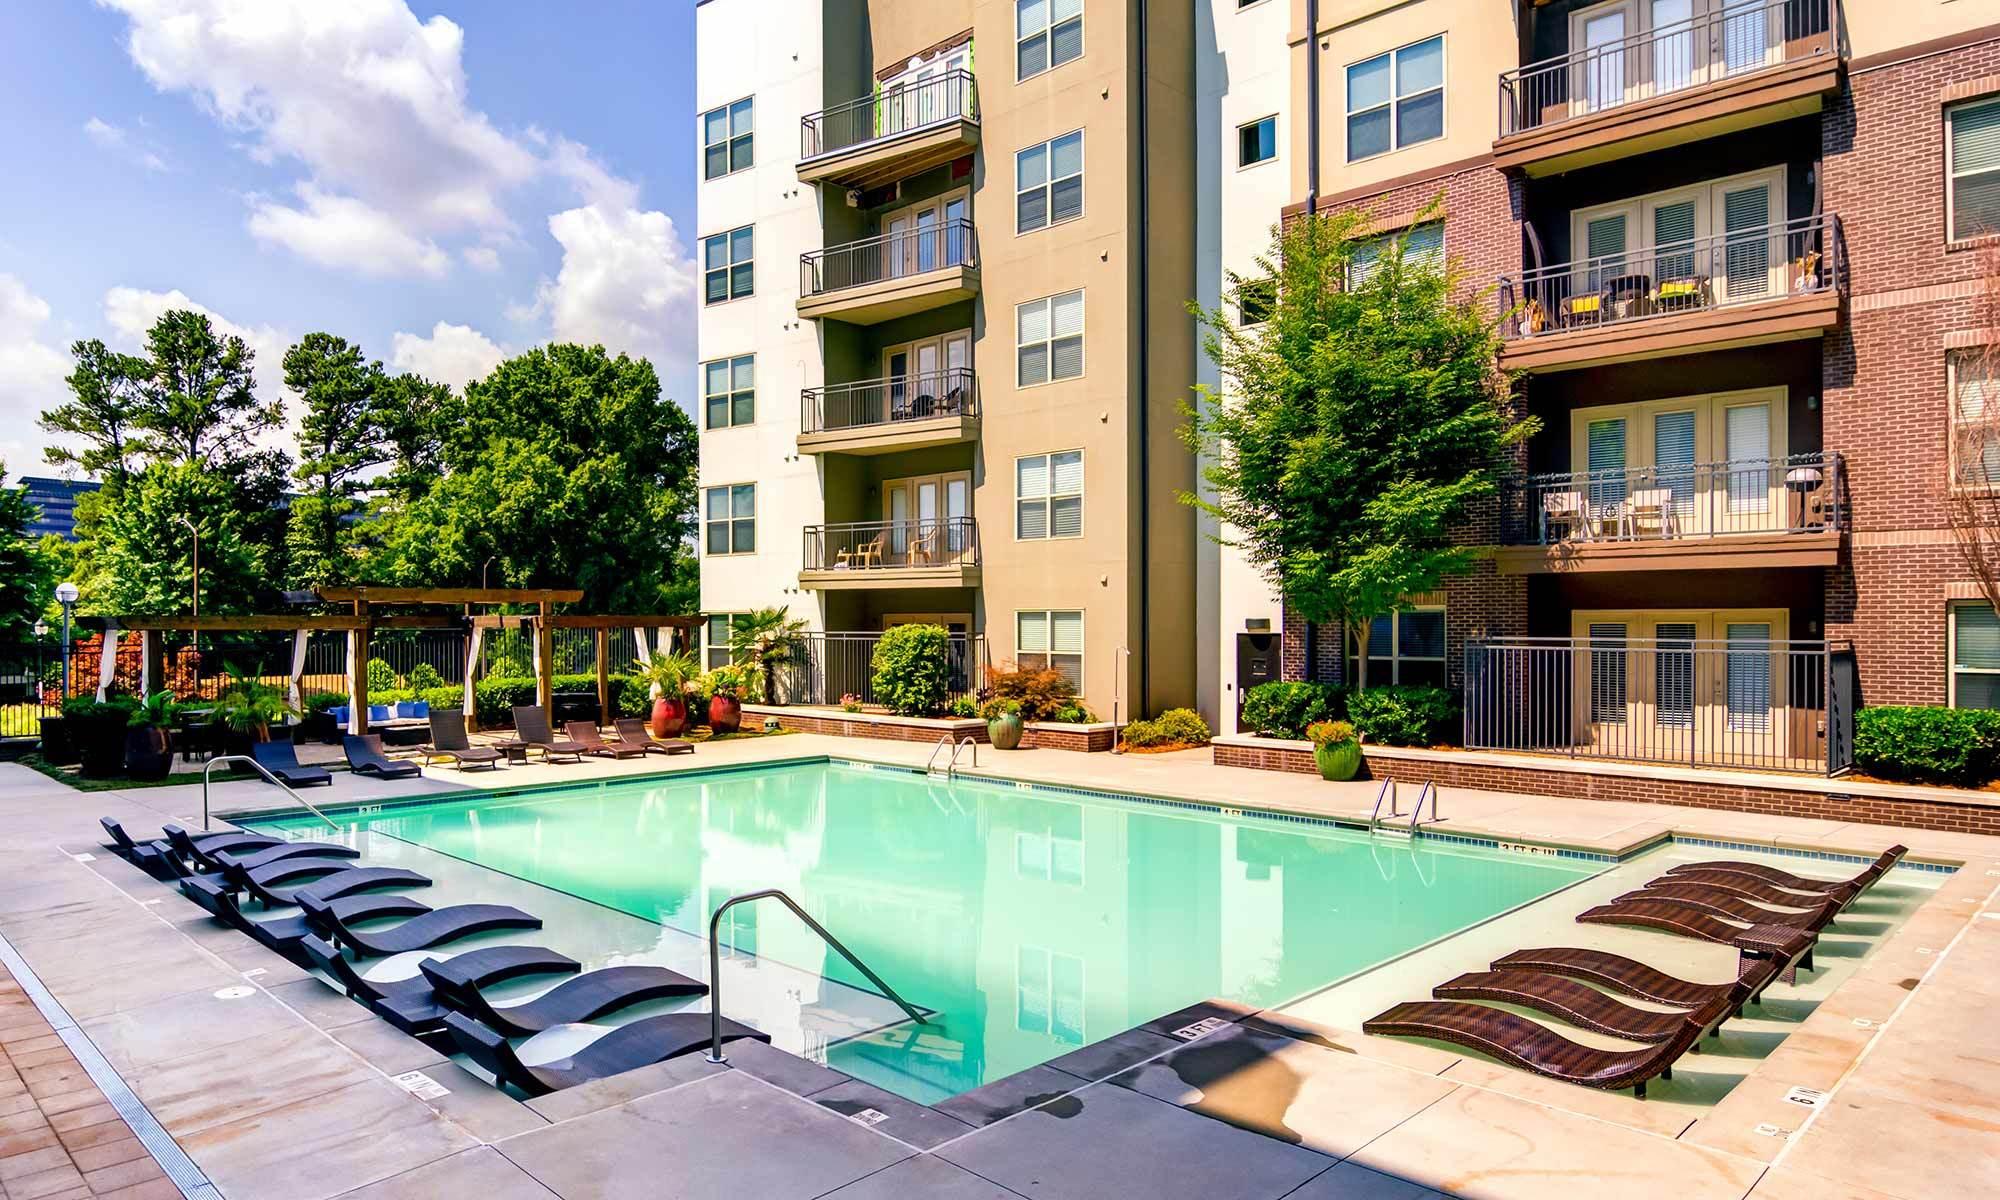 Apartments for Rent in Atlanta GA near Sandy Springs